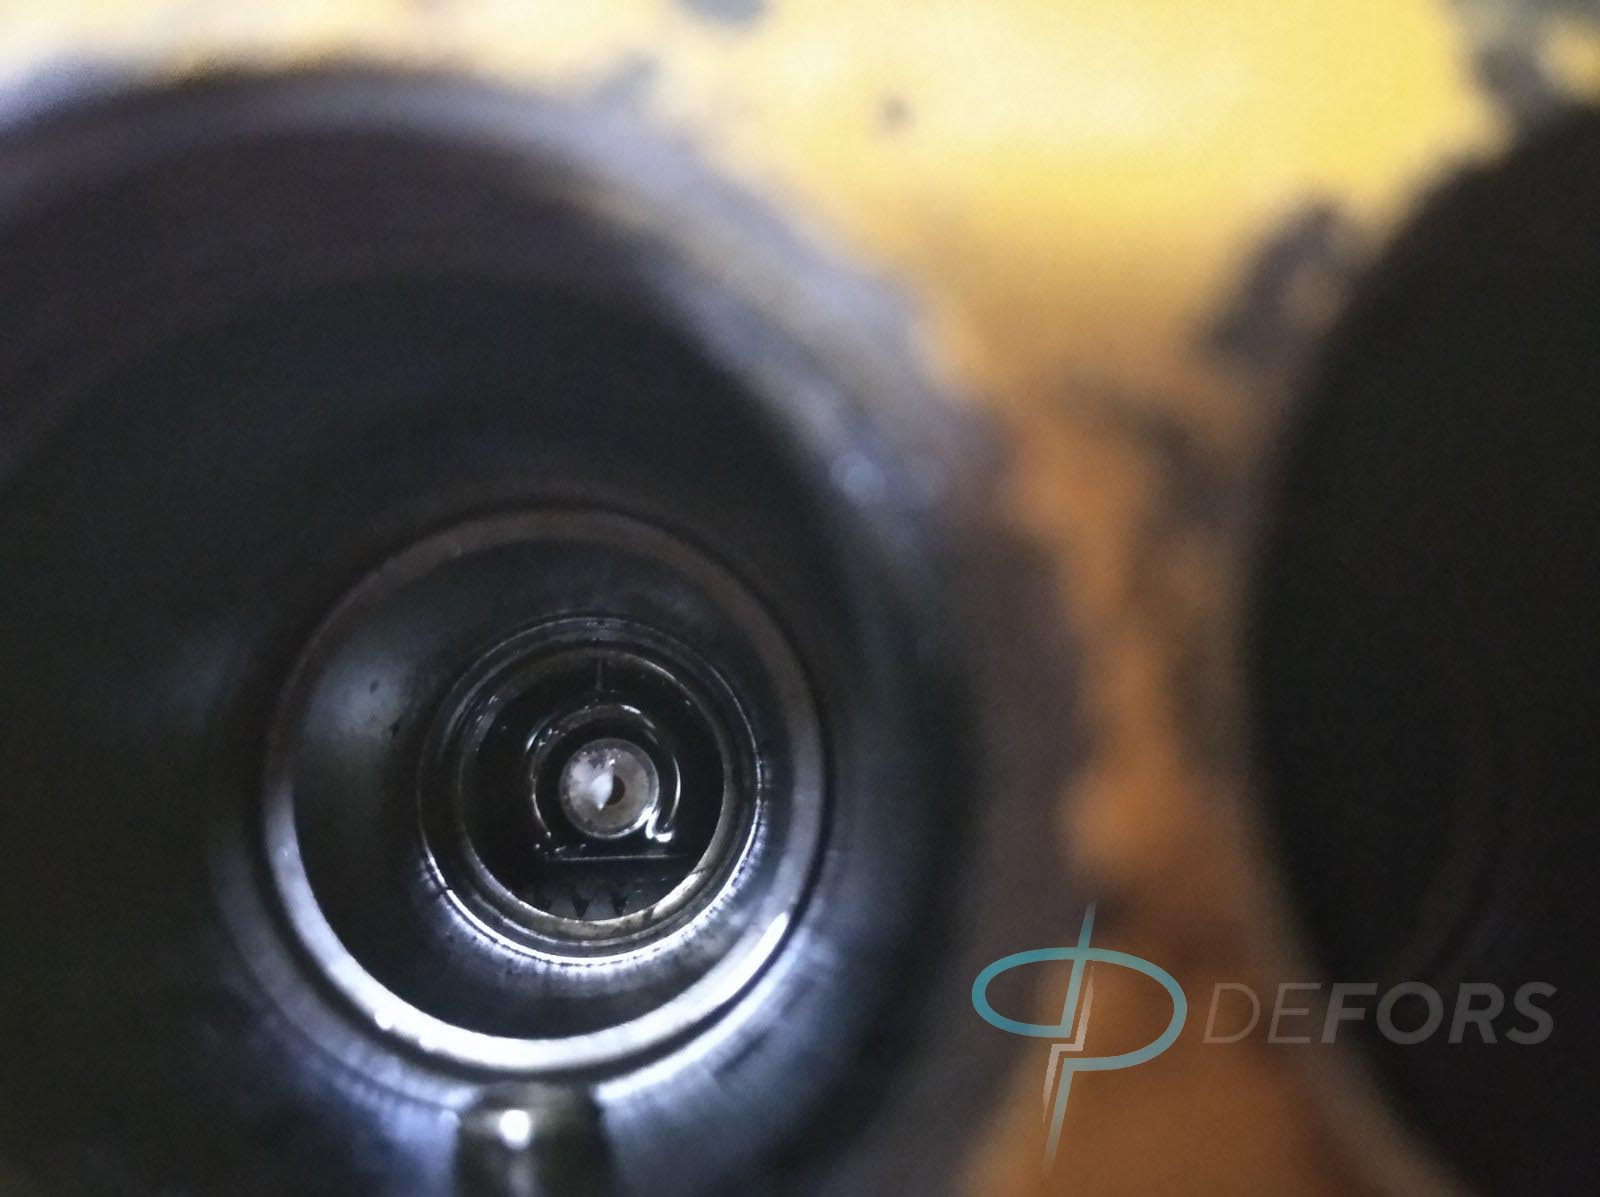 Замена плунжера ТНВД Caterpillar 3306 4P1400